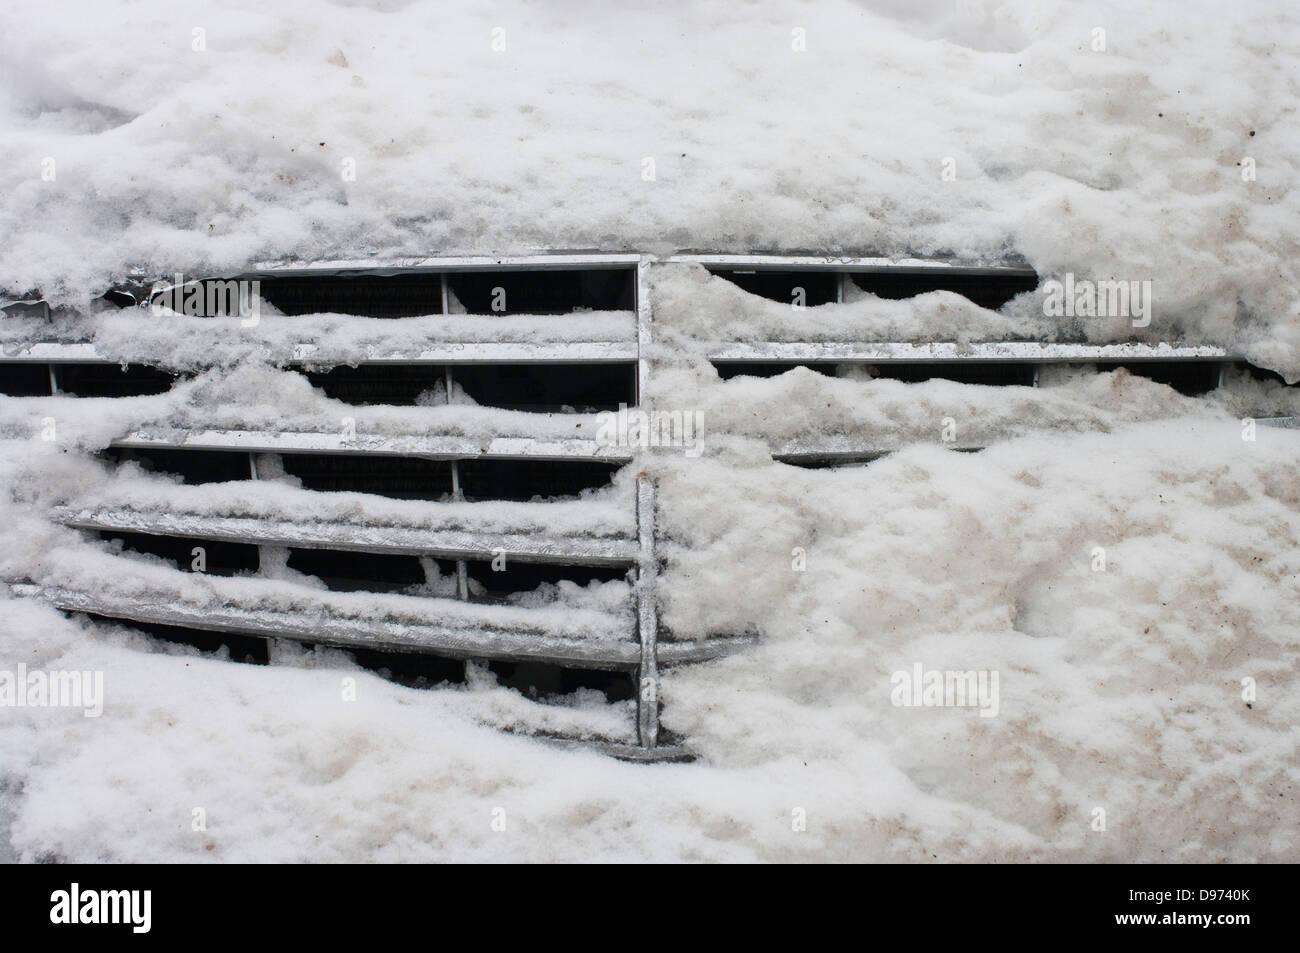 Germany, Hesse, Frankfurt, Snow on car radiator - Stock Image